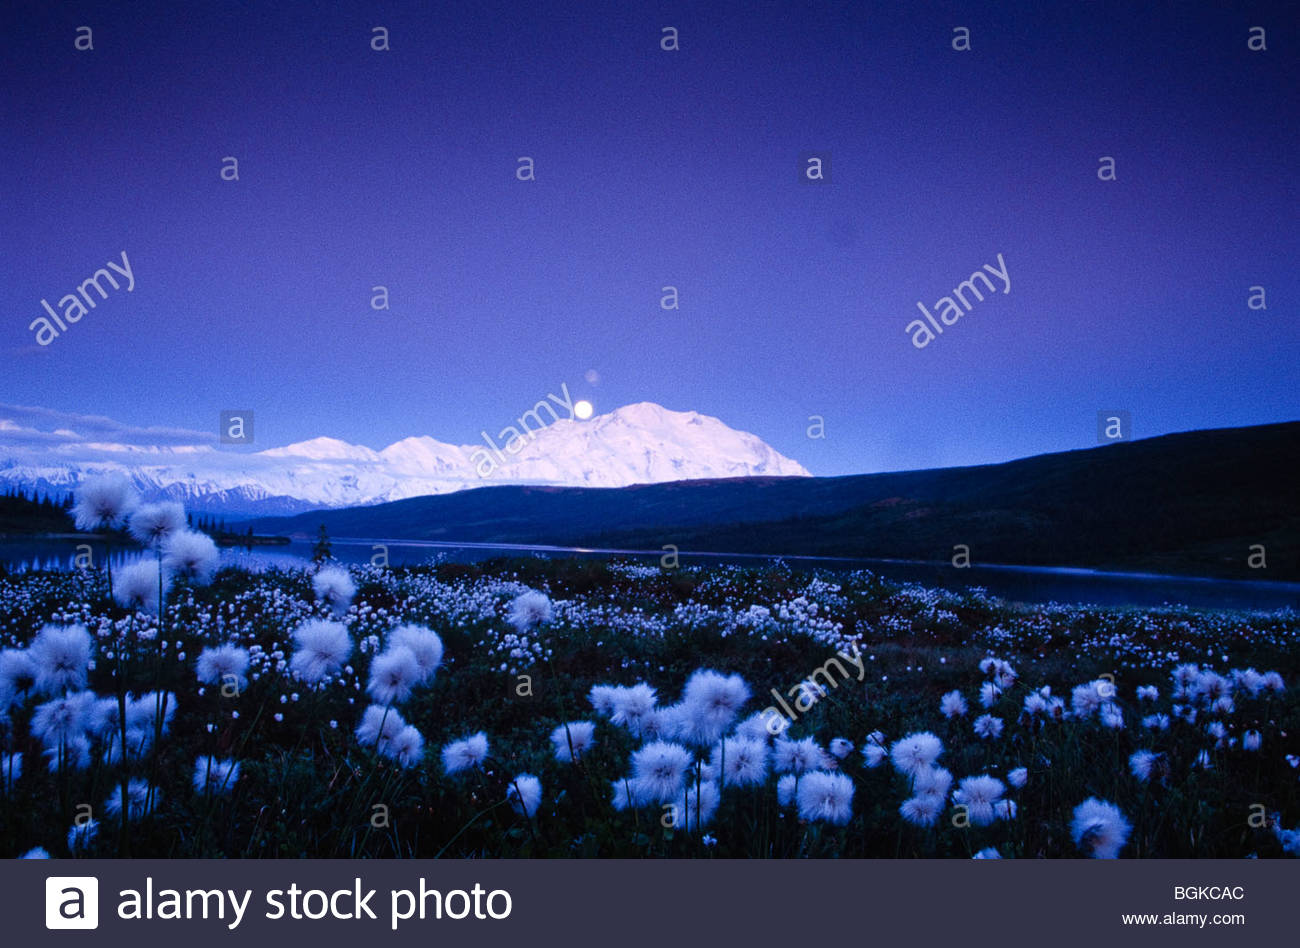 Alaska, Denali National Park, Wonder Lake. Moonrise above snow-capped Mt. McKinley. - Stock Image